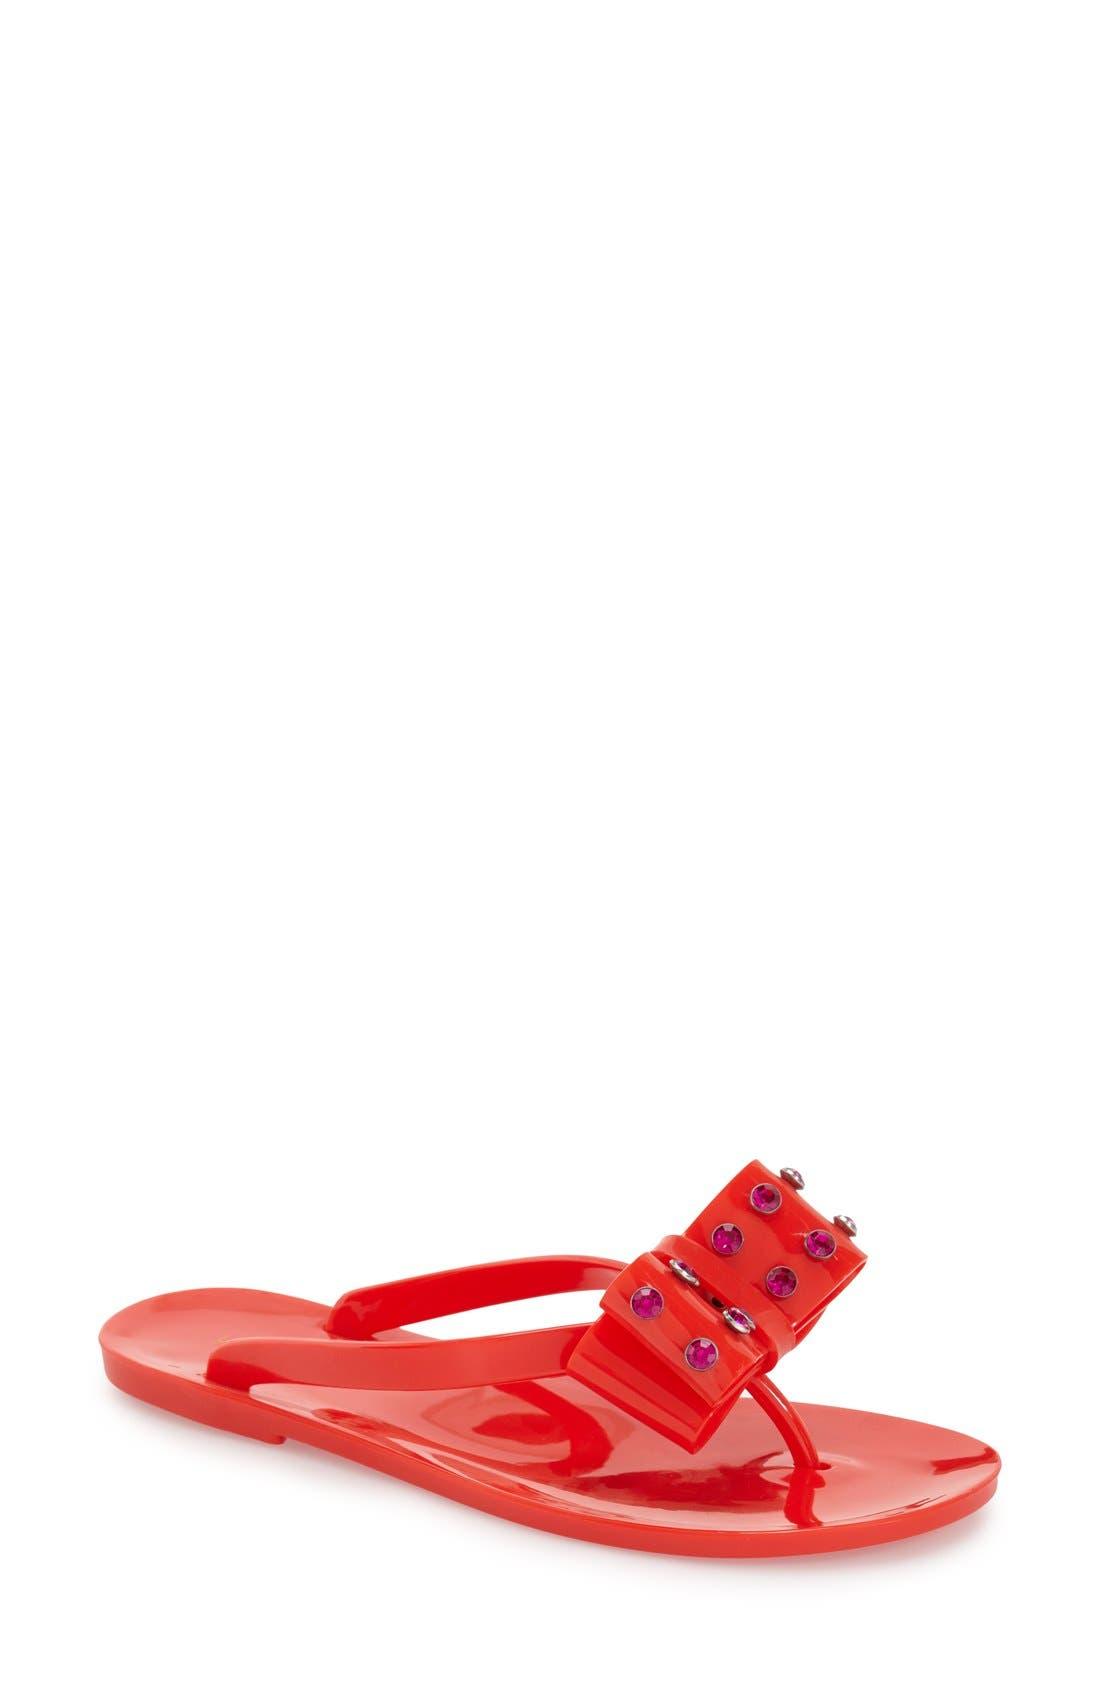 Main Image - kate spade new york 'francy' crystal bow flip flop (Women)